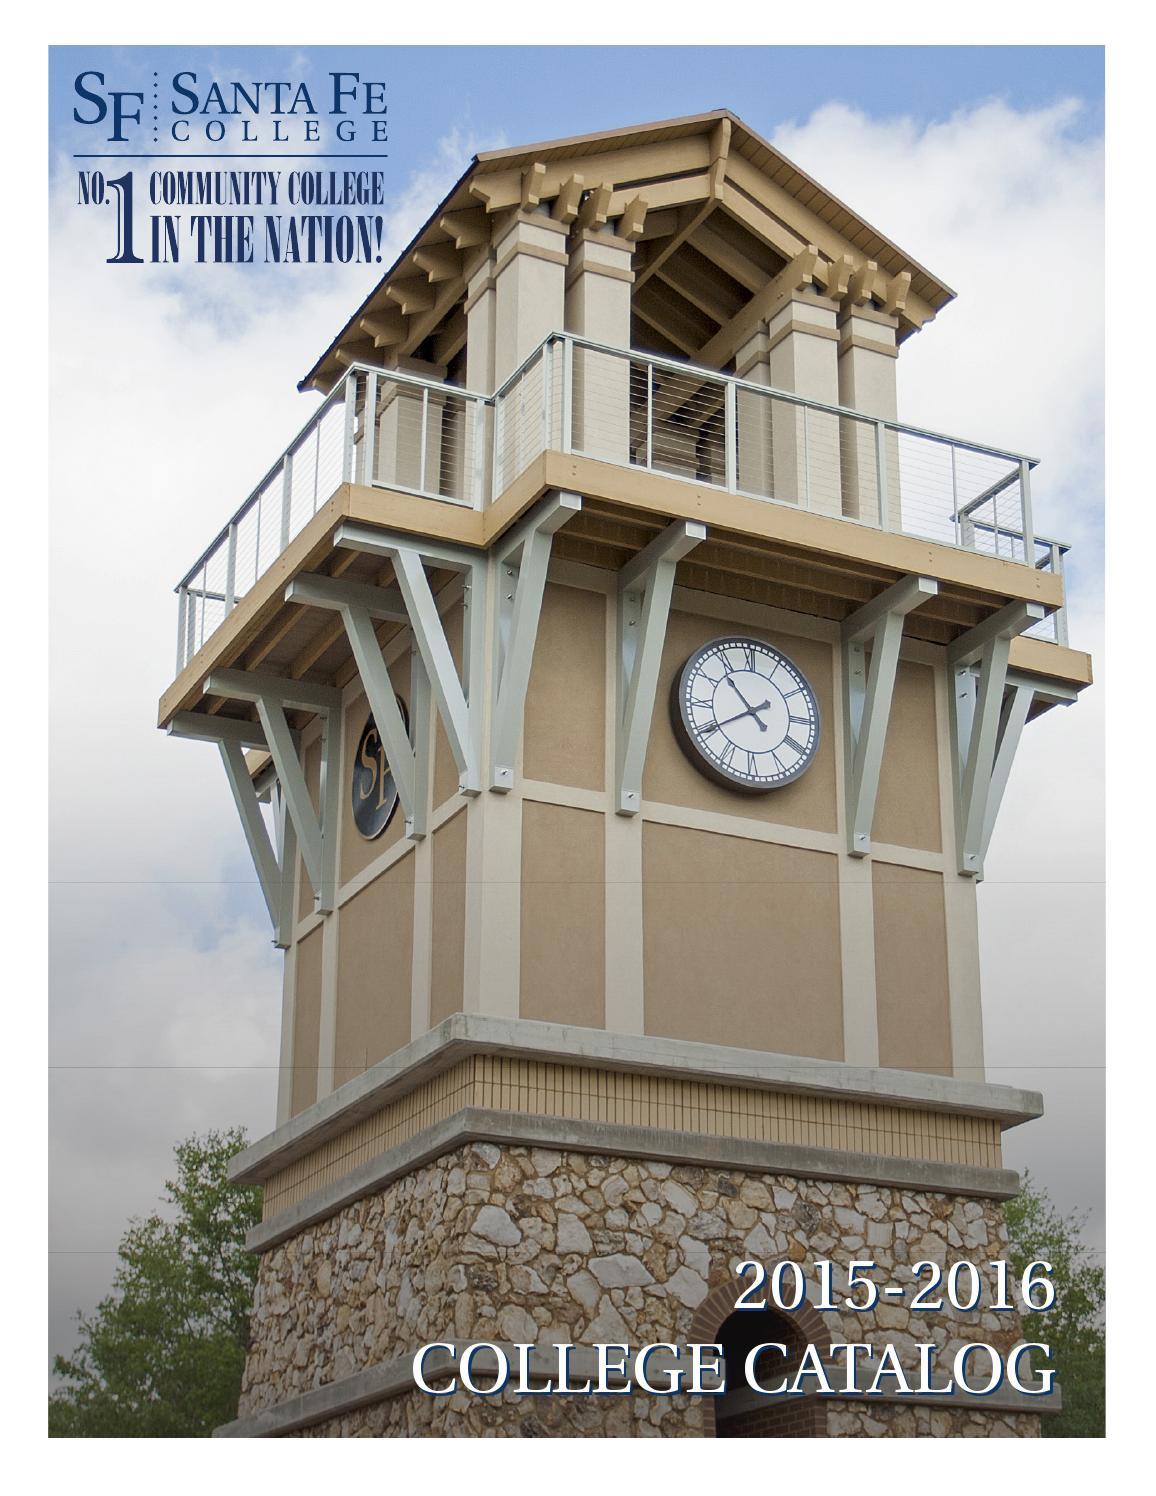 Santa Fe College's 2015-2016 College Catalog by Santa Fe